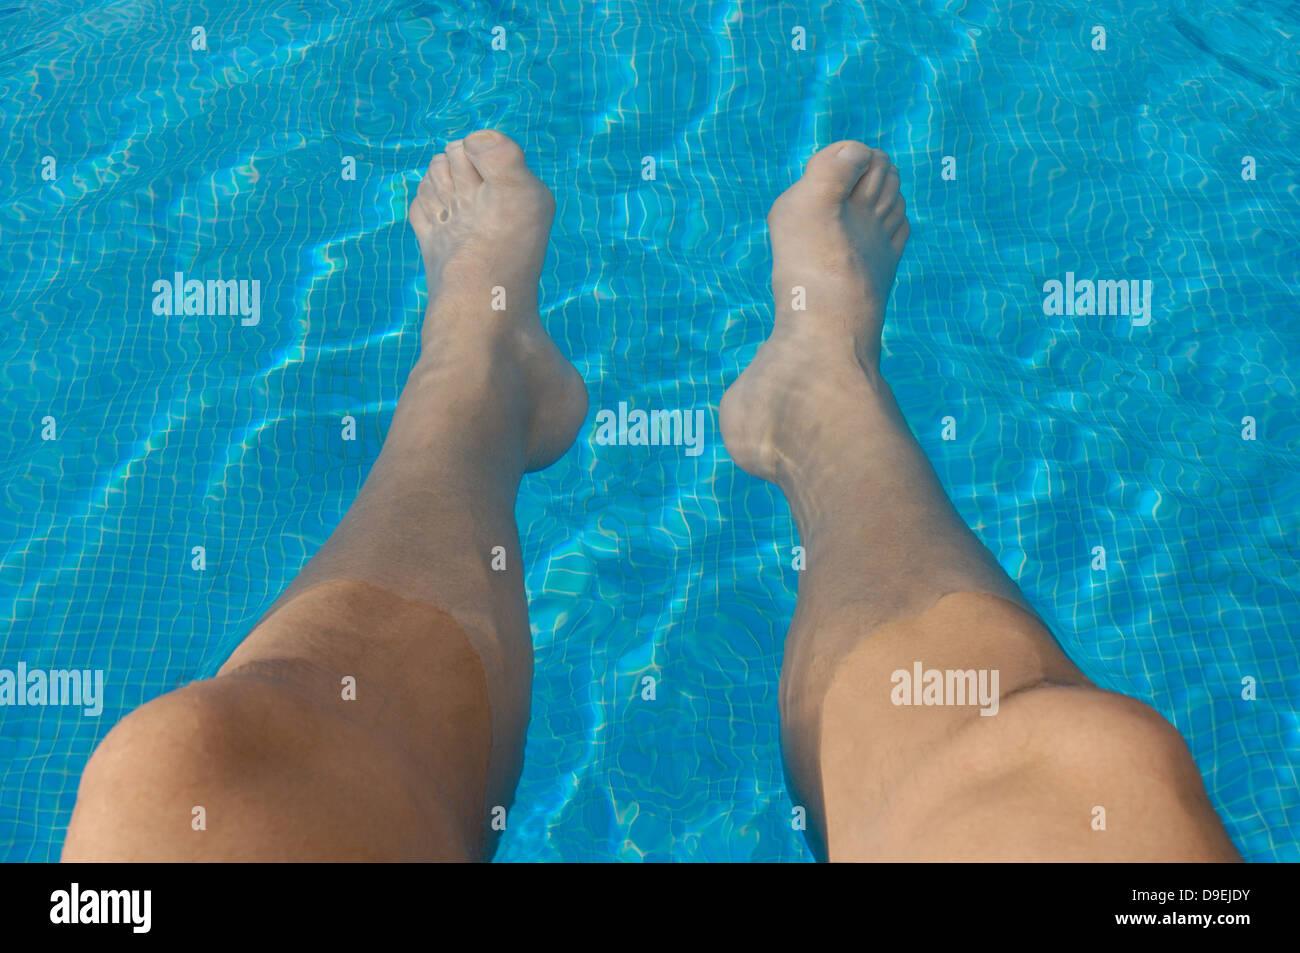 Man's legs dangle in the swimming pool - Stock Image